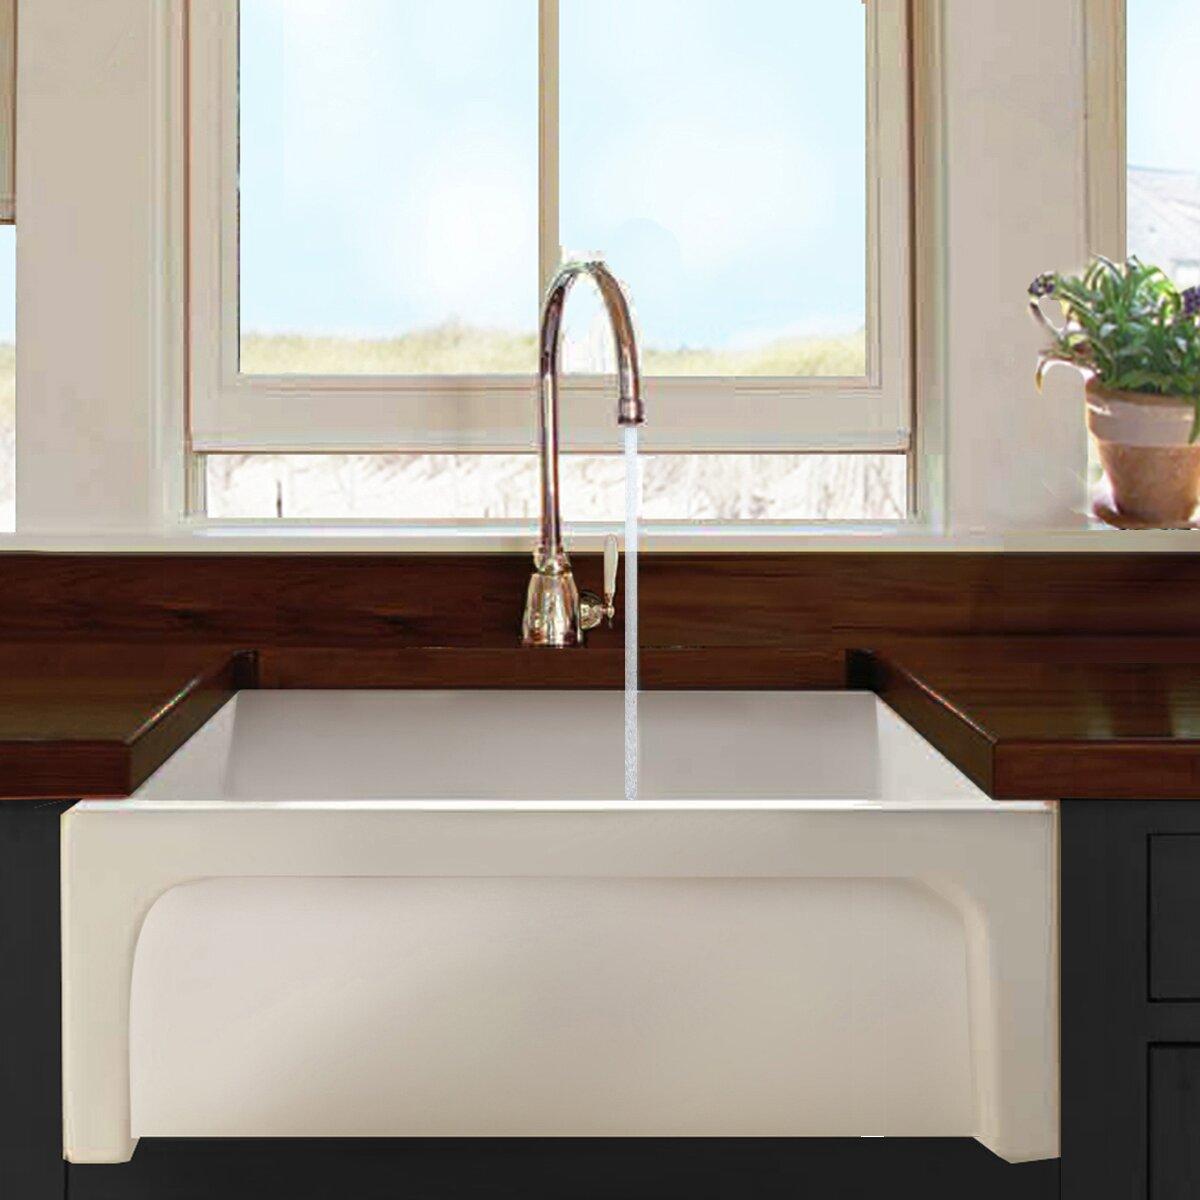 Nantucket Sinks 30 X 18 Chatham Single Bowl Kitchen Sink Chatham Reviews Wayfair